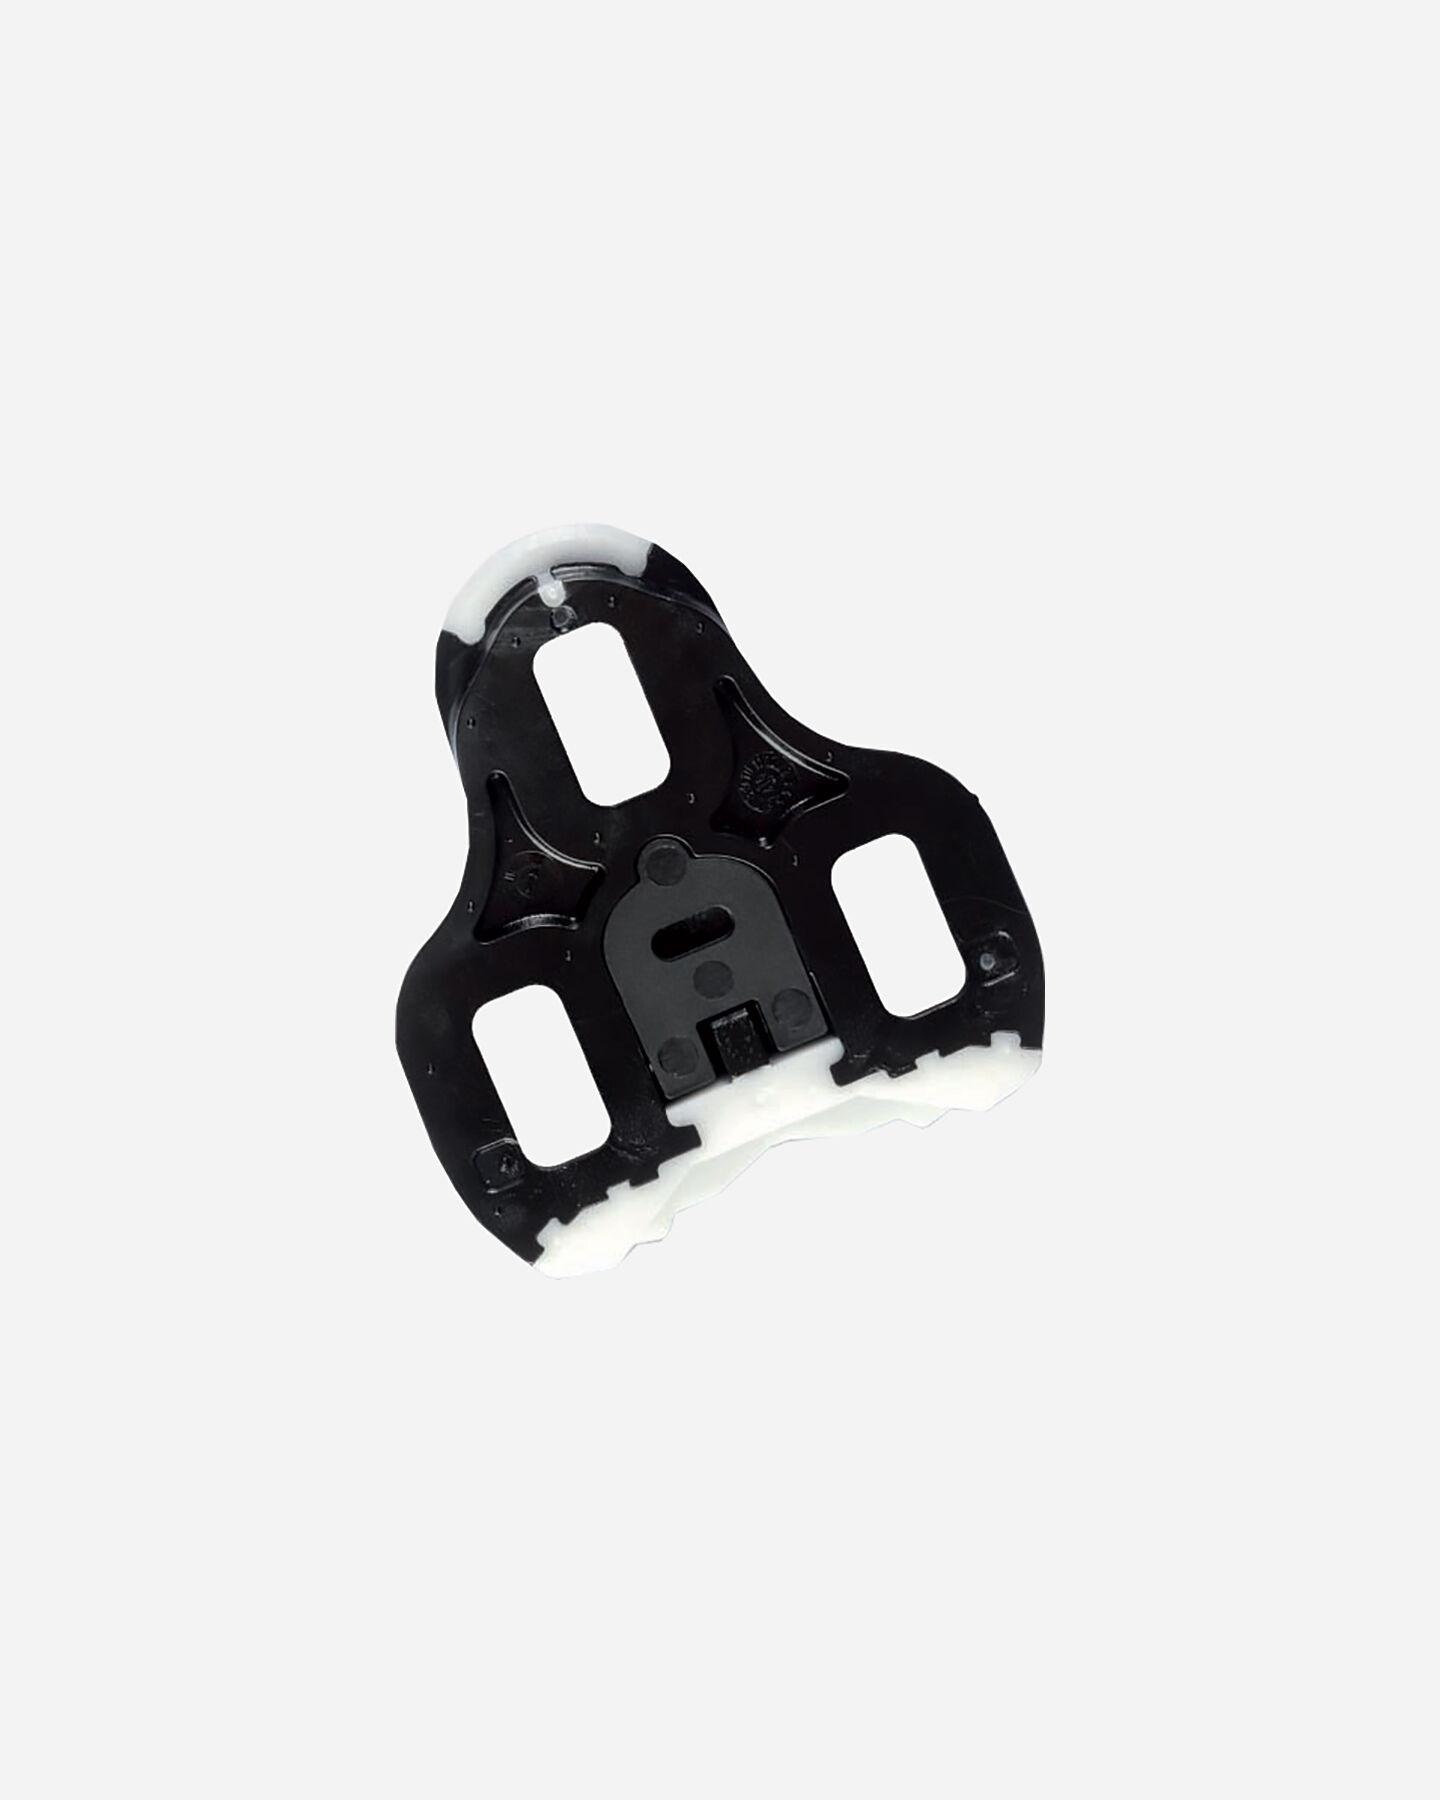 Pedali BONIN LOOK KEO CLEAT  S1259970|1|UNI scatto 1